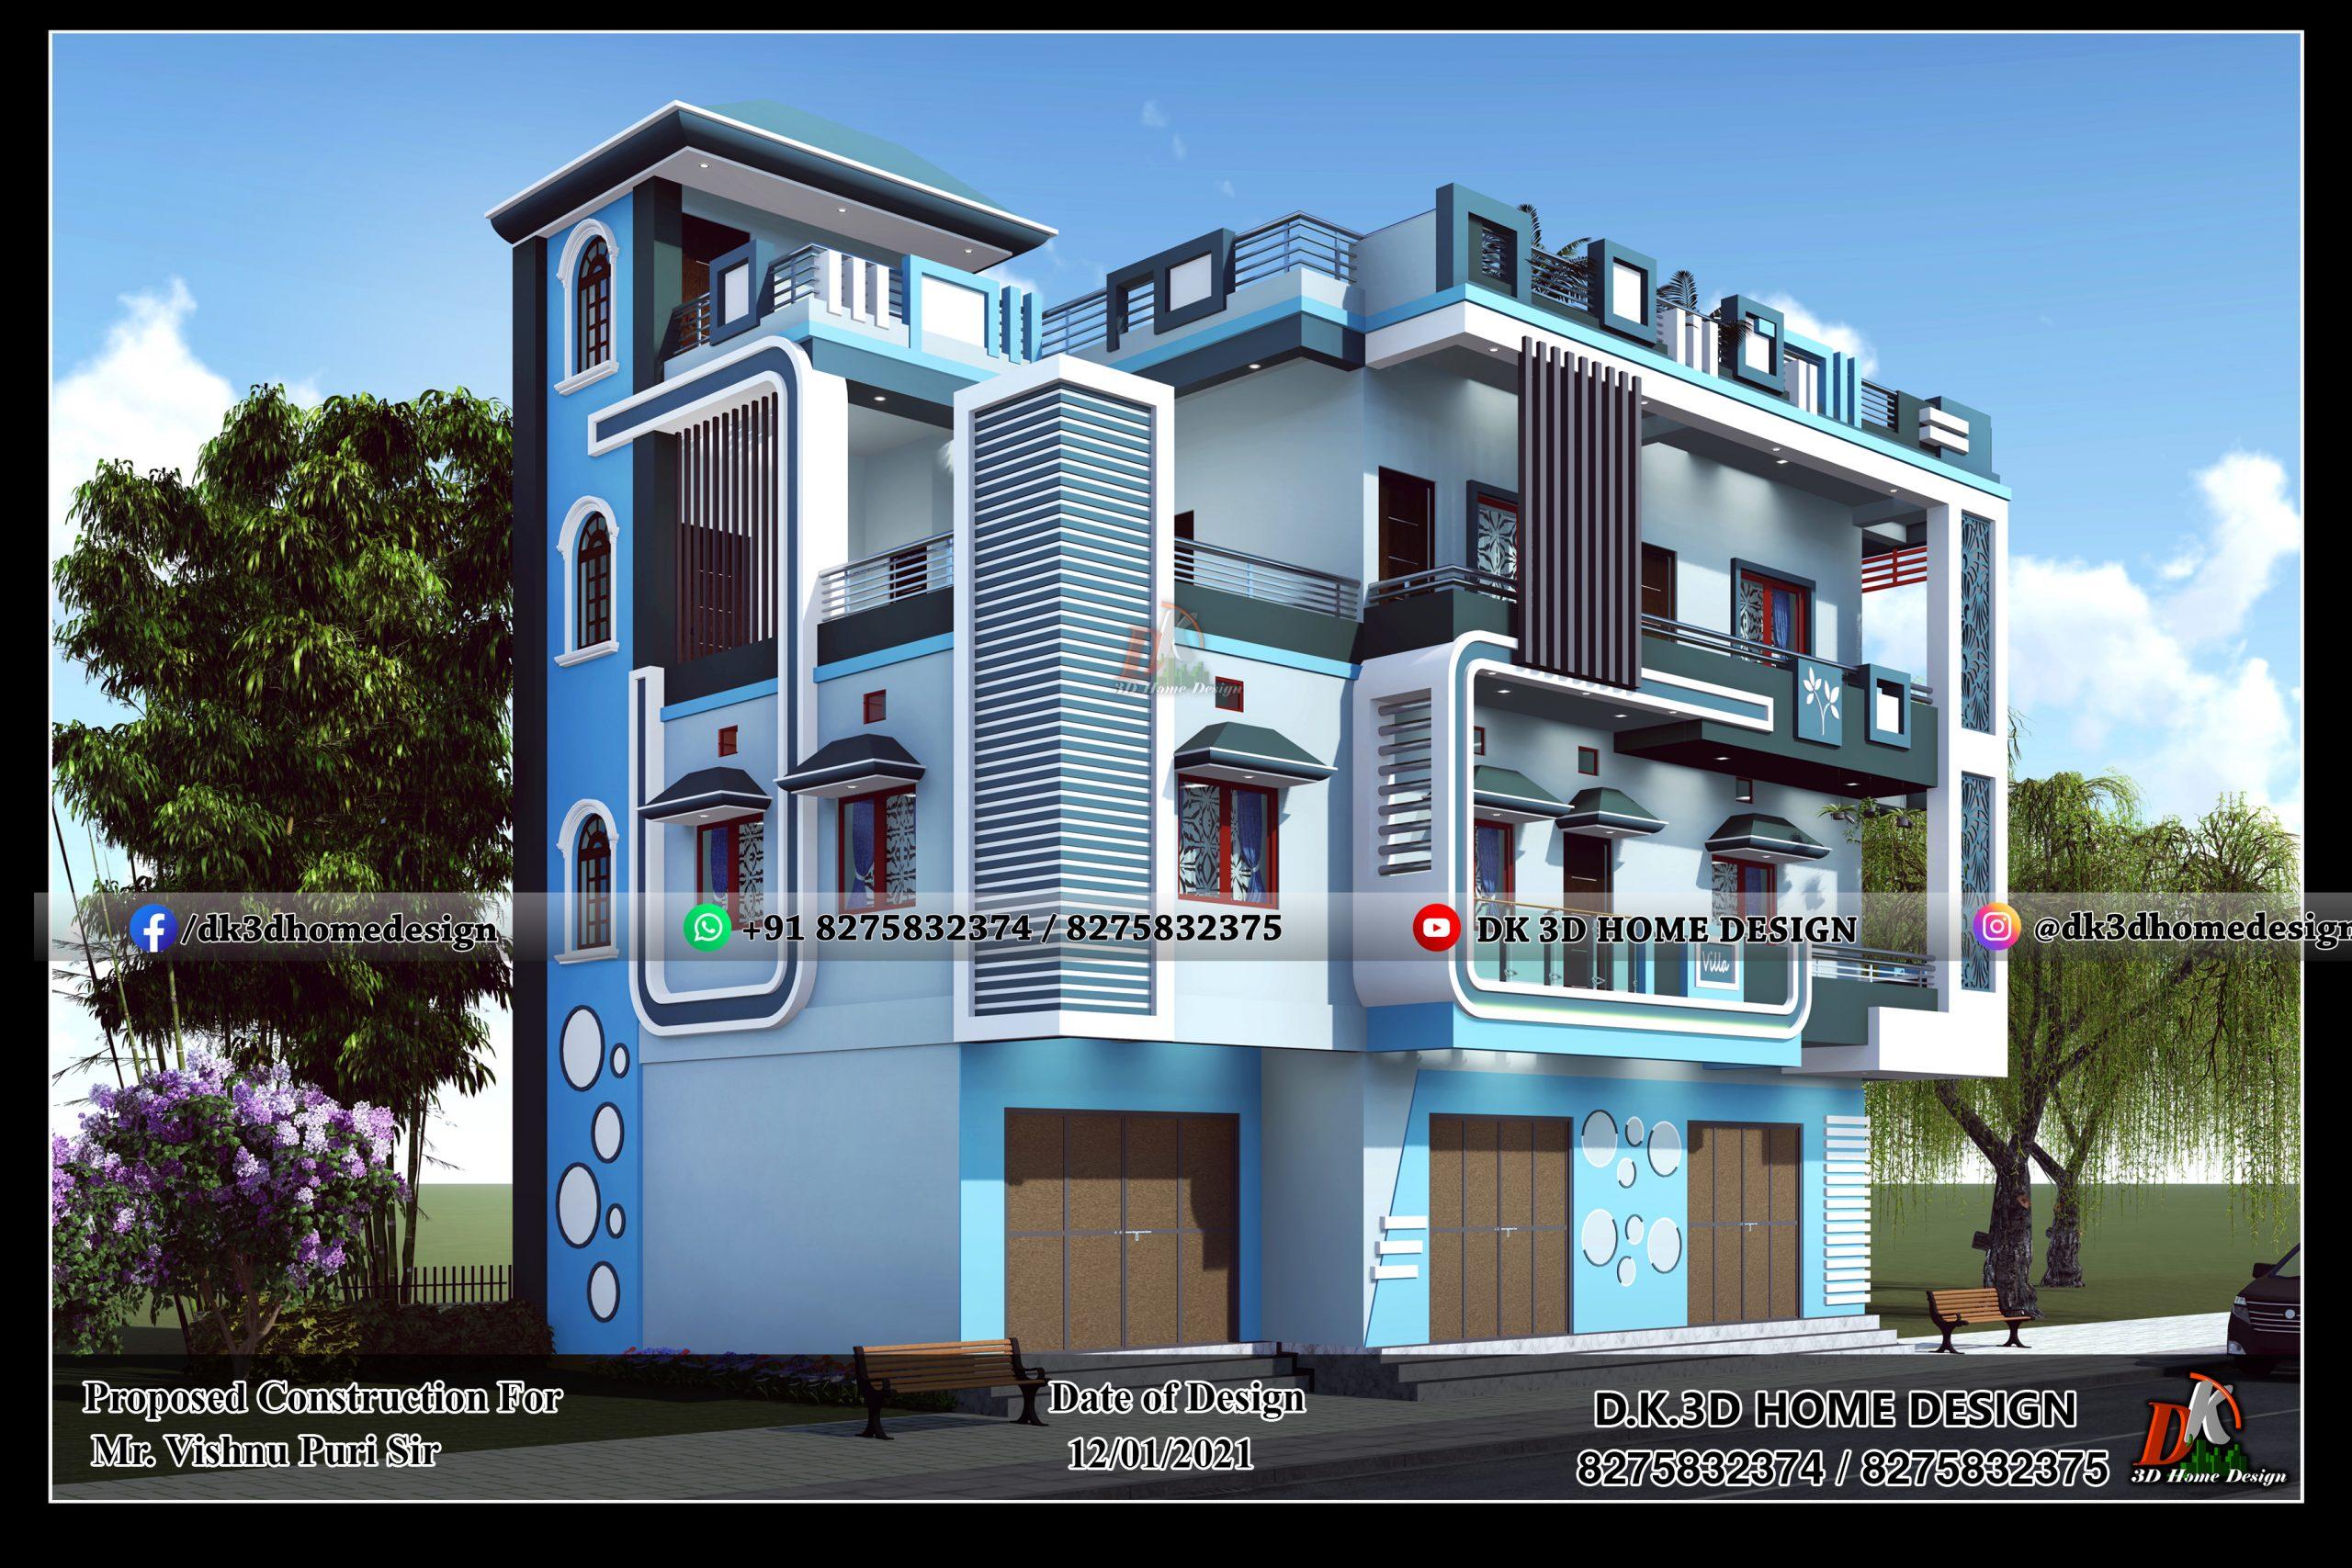 G+2 house design